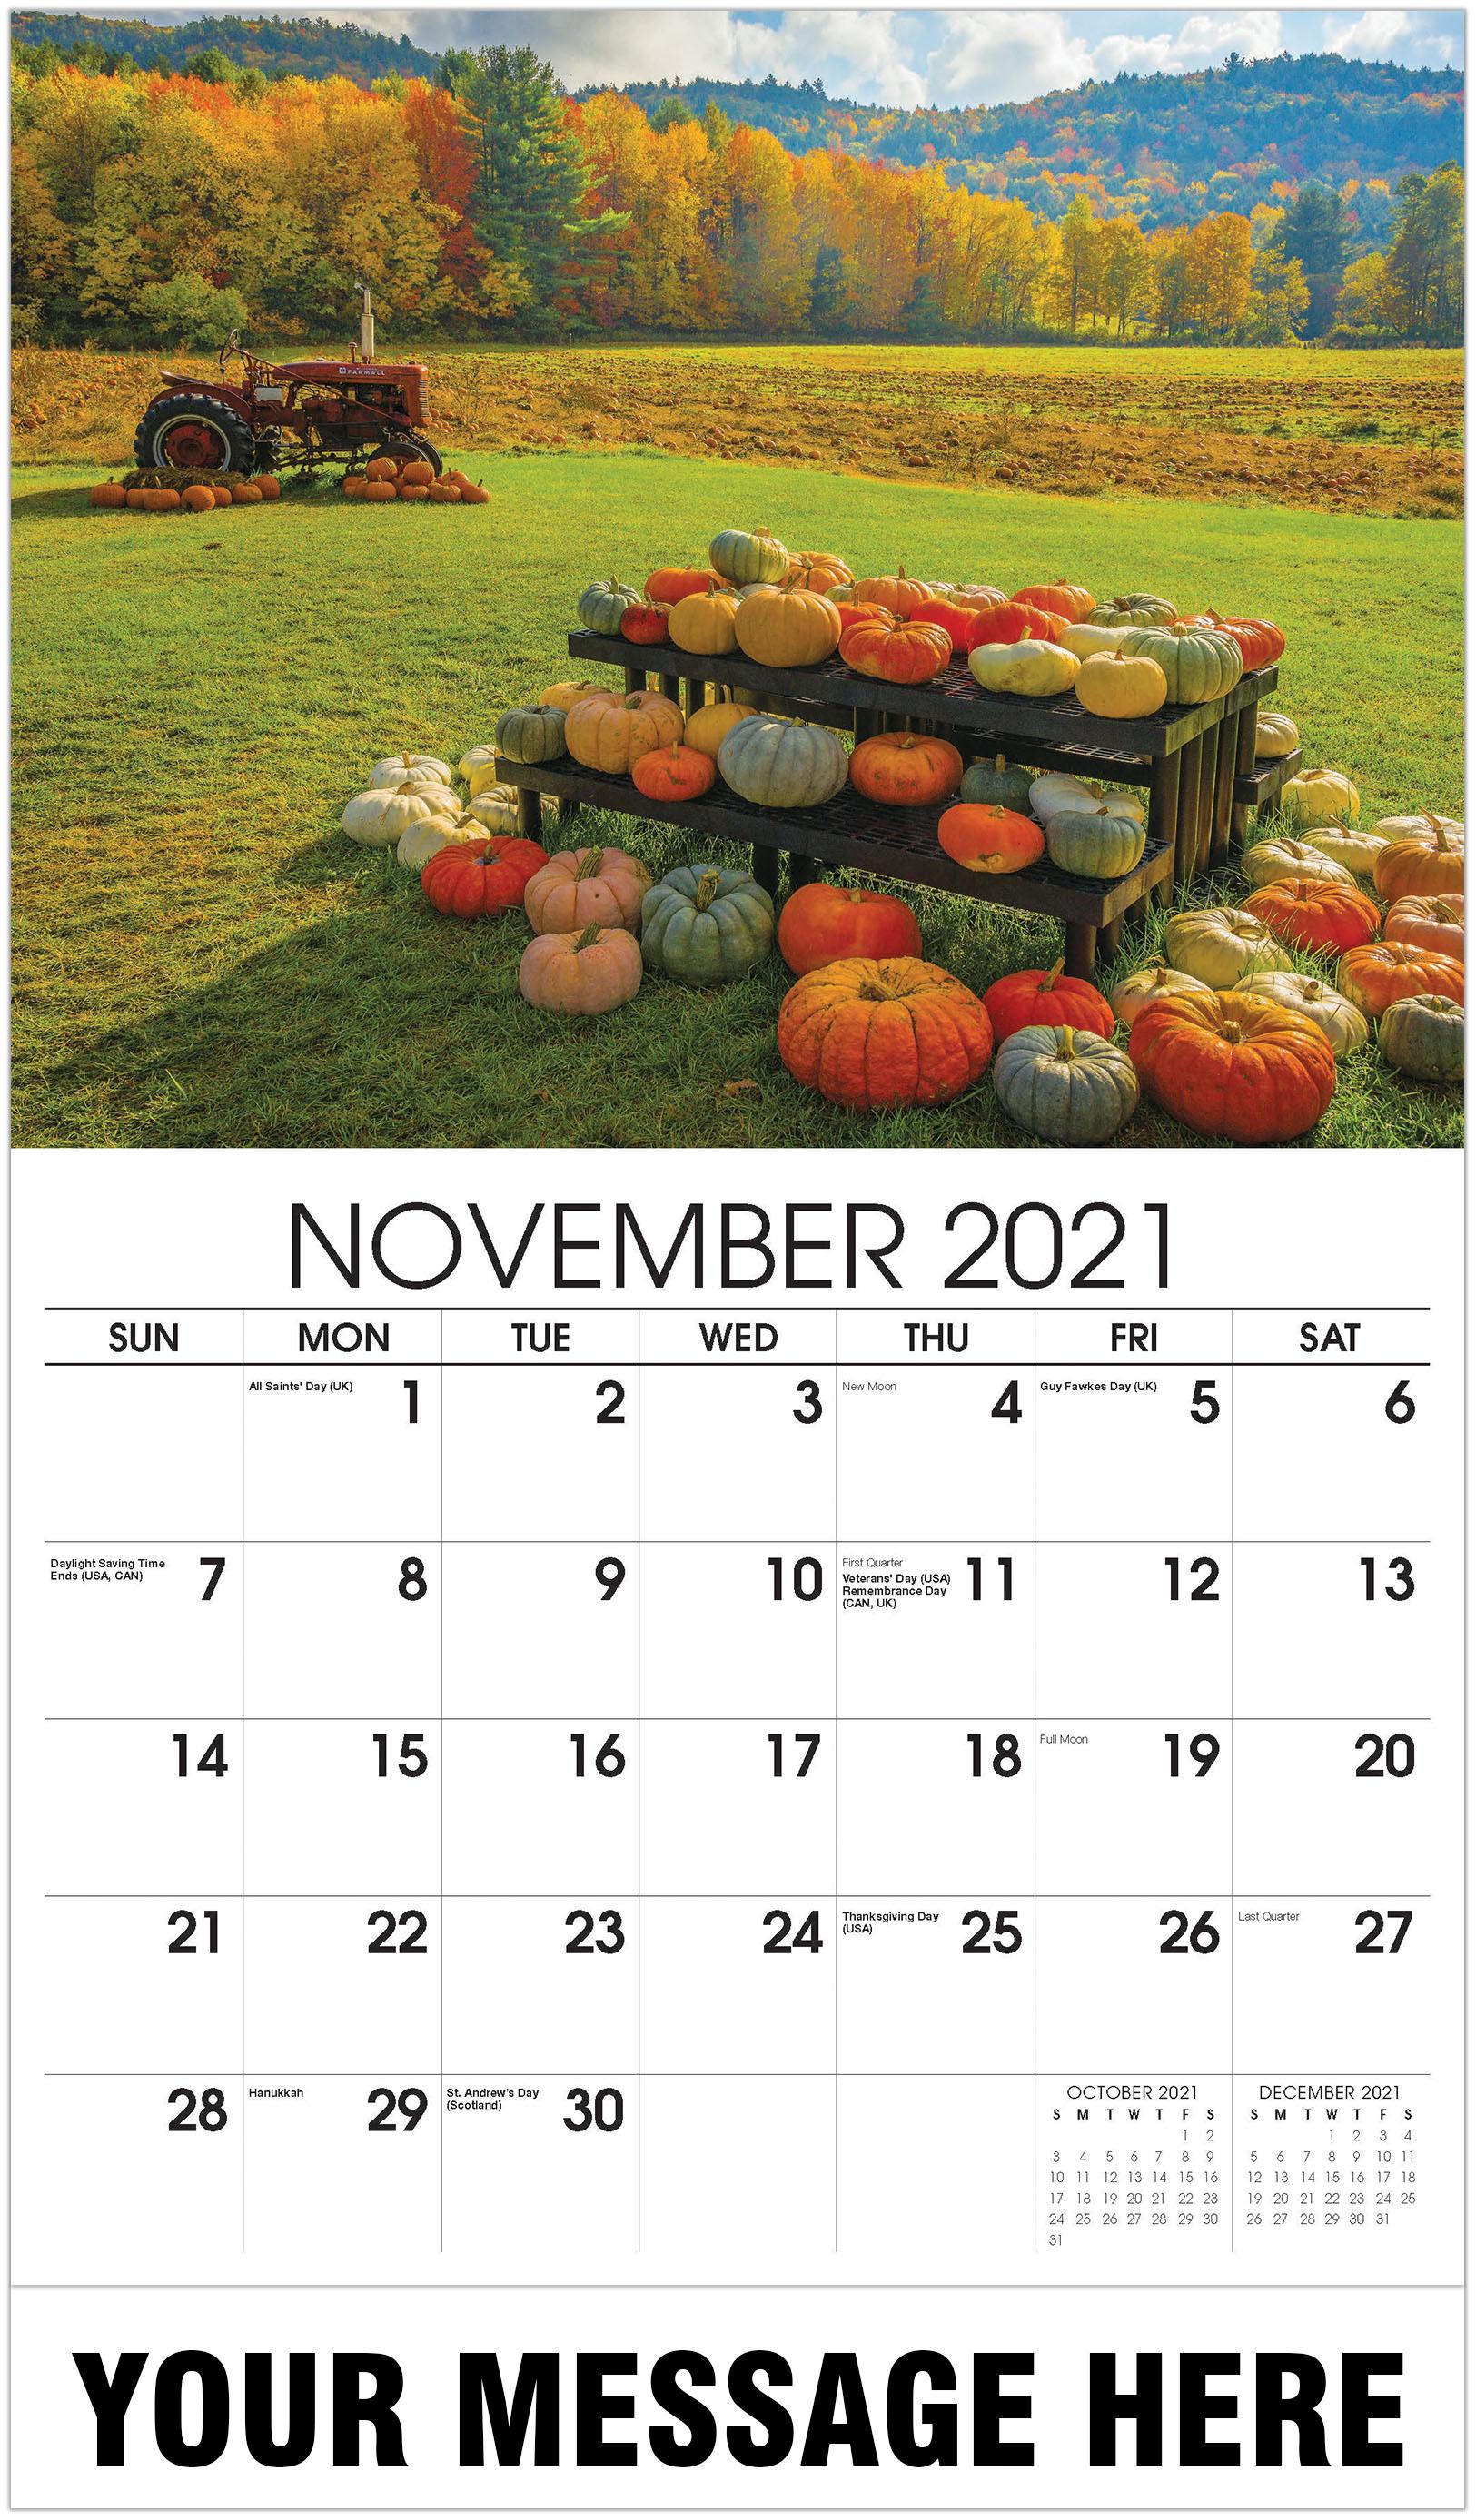 Pumpkins - November - Country Spirit 2021 Promotional Calendar